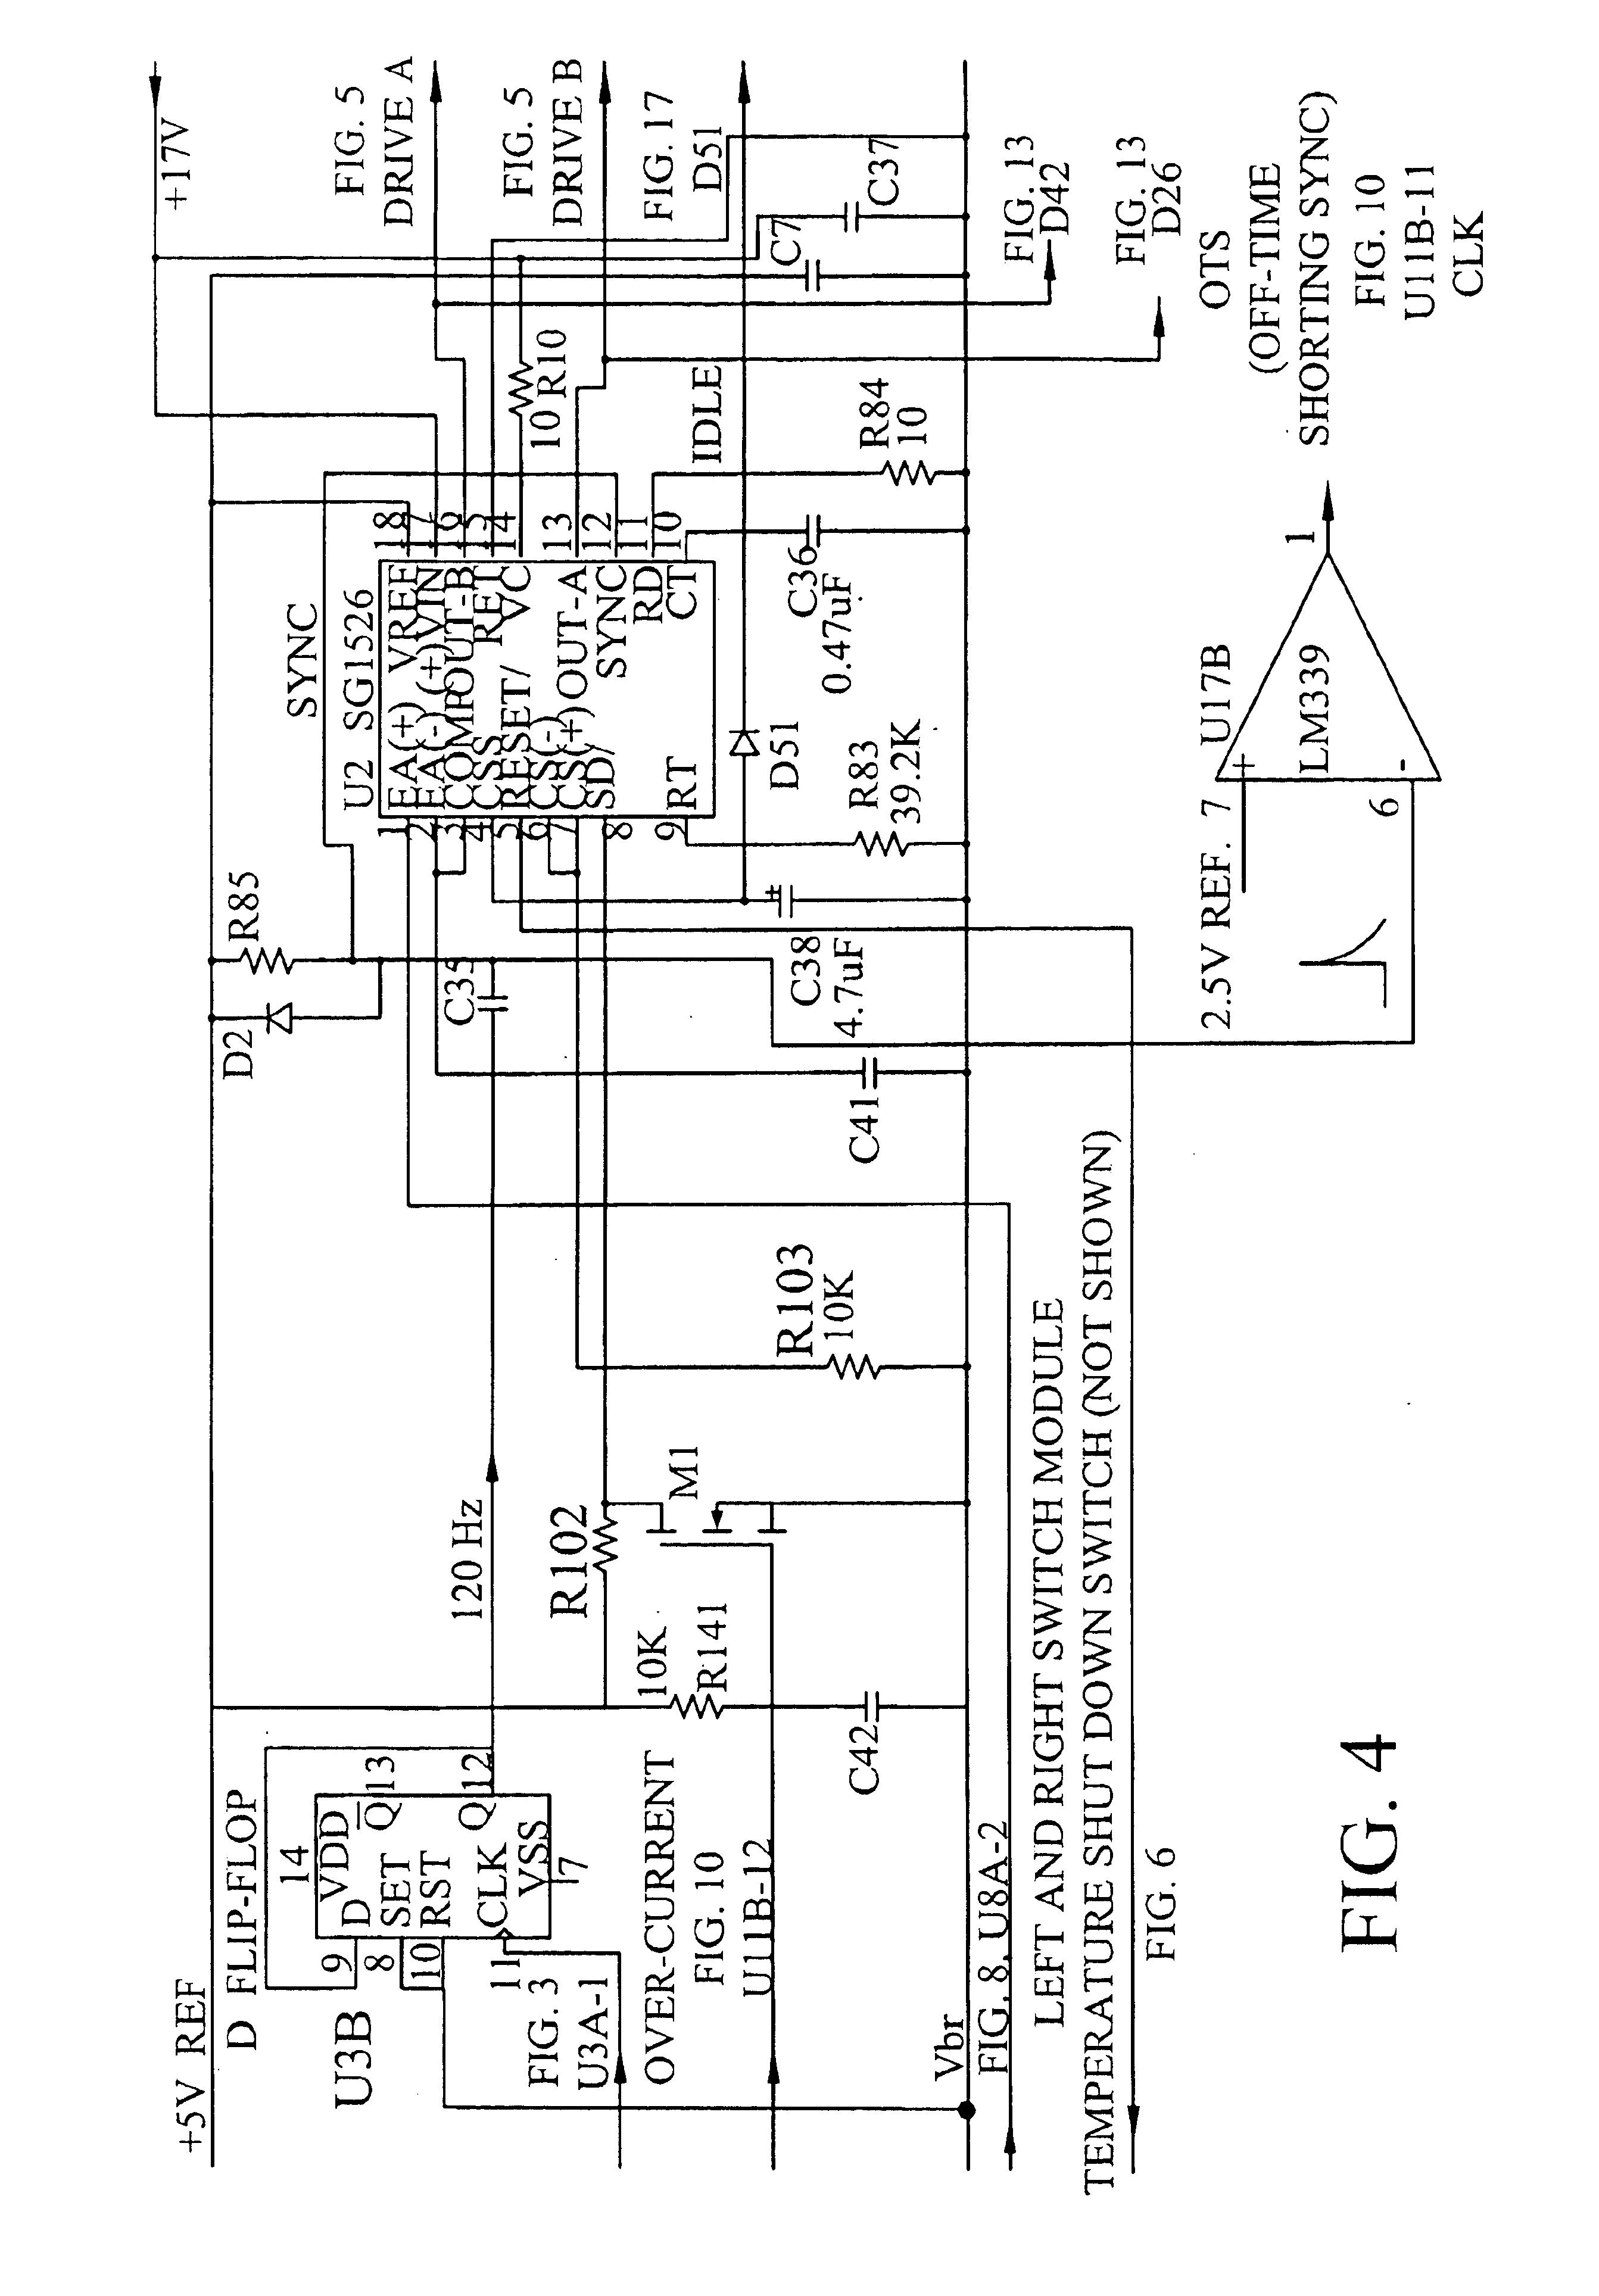 W Inverter Wiring Diagram